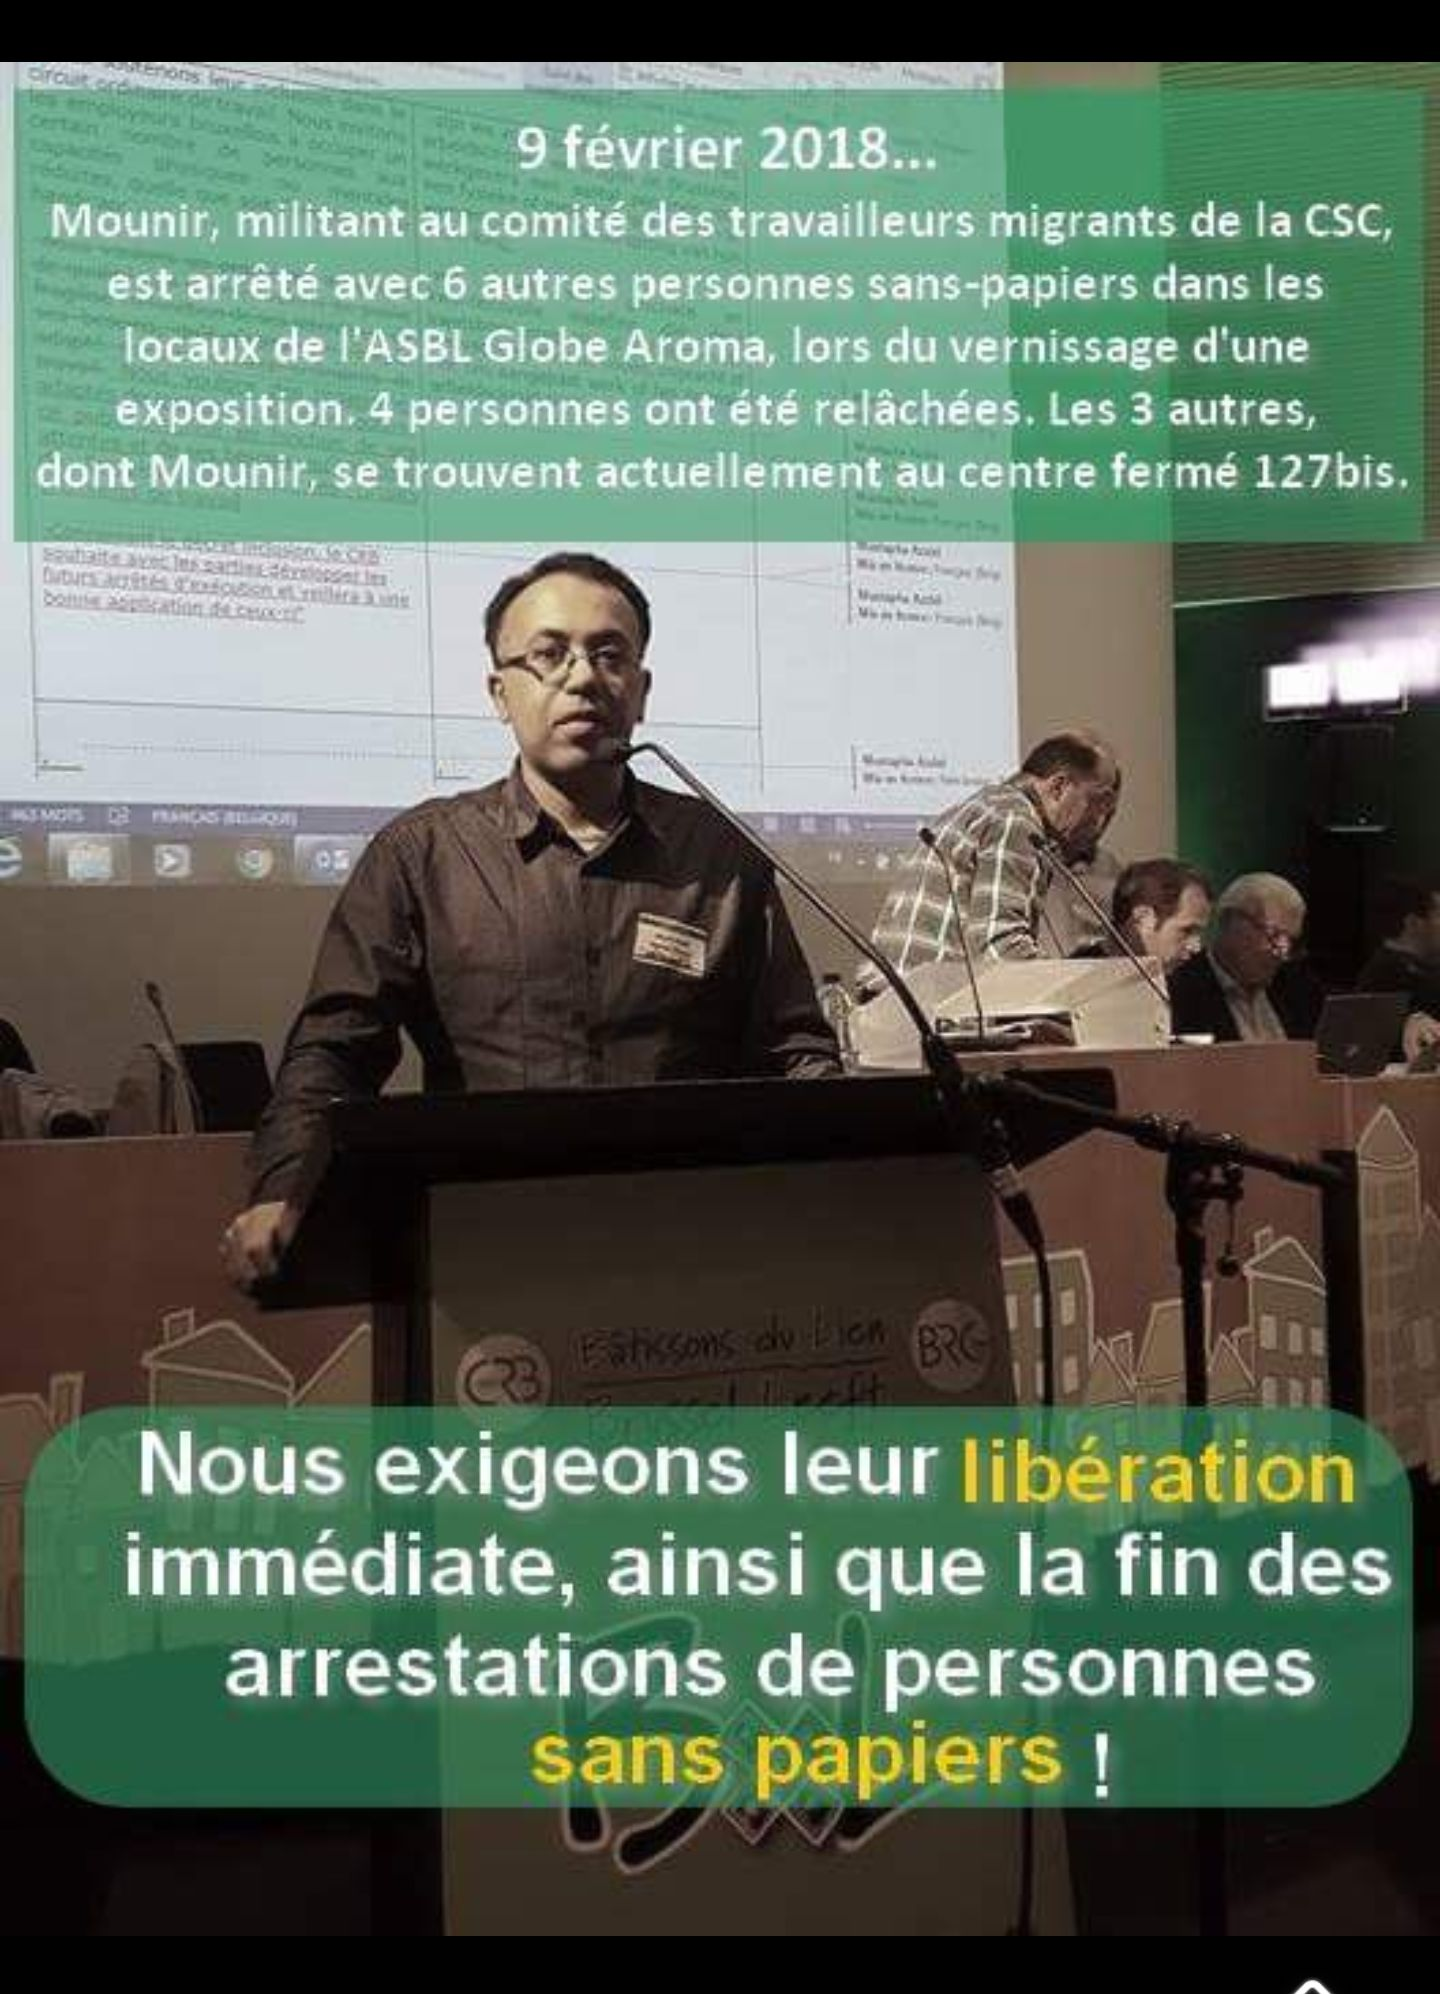 Liberté pour Mounir !